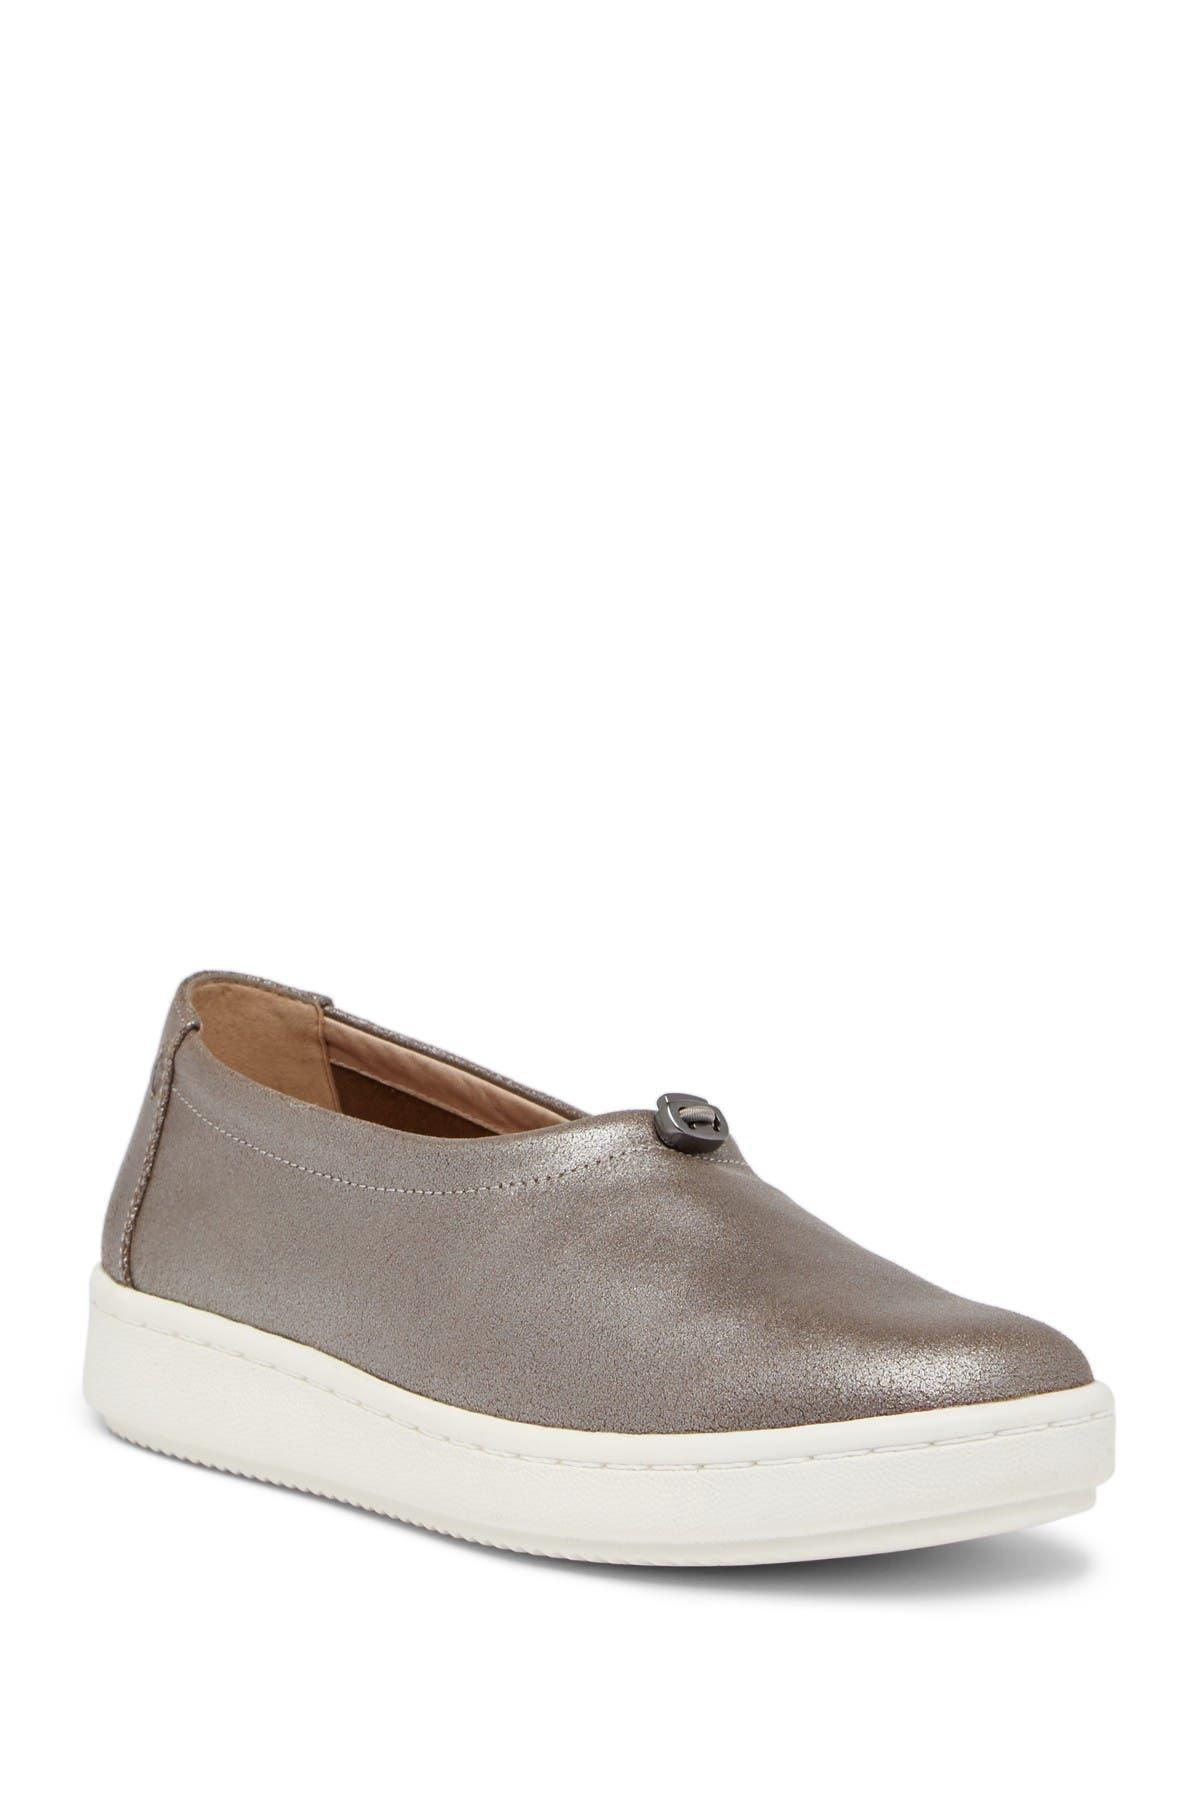 Eileen Fisher   Sydney Slip-On Sneaker